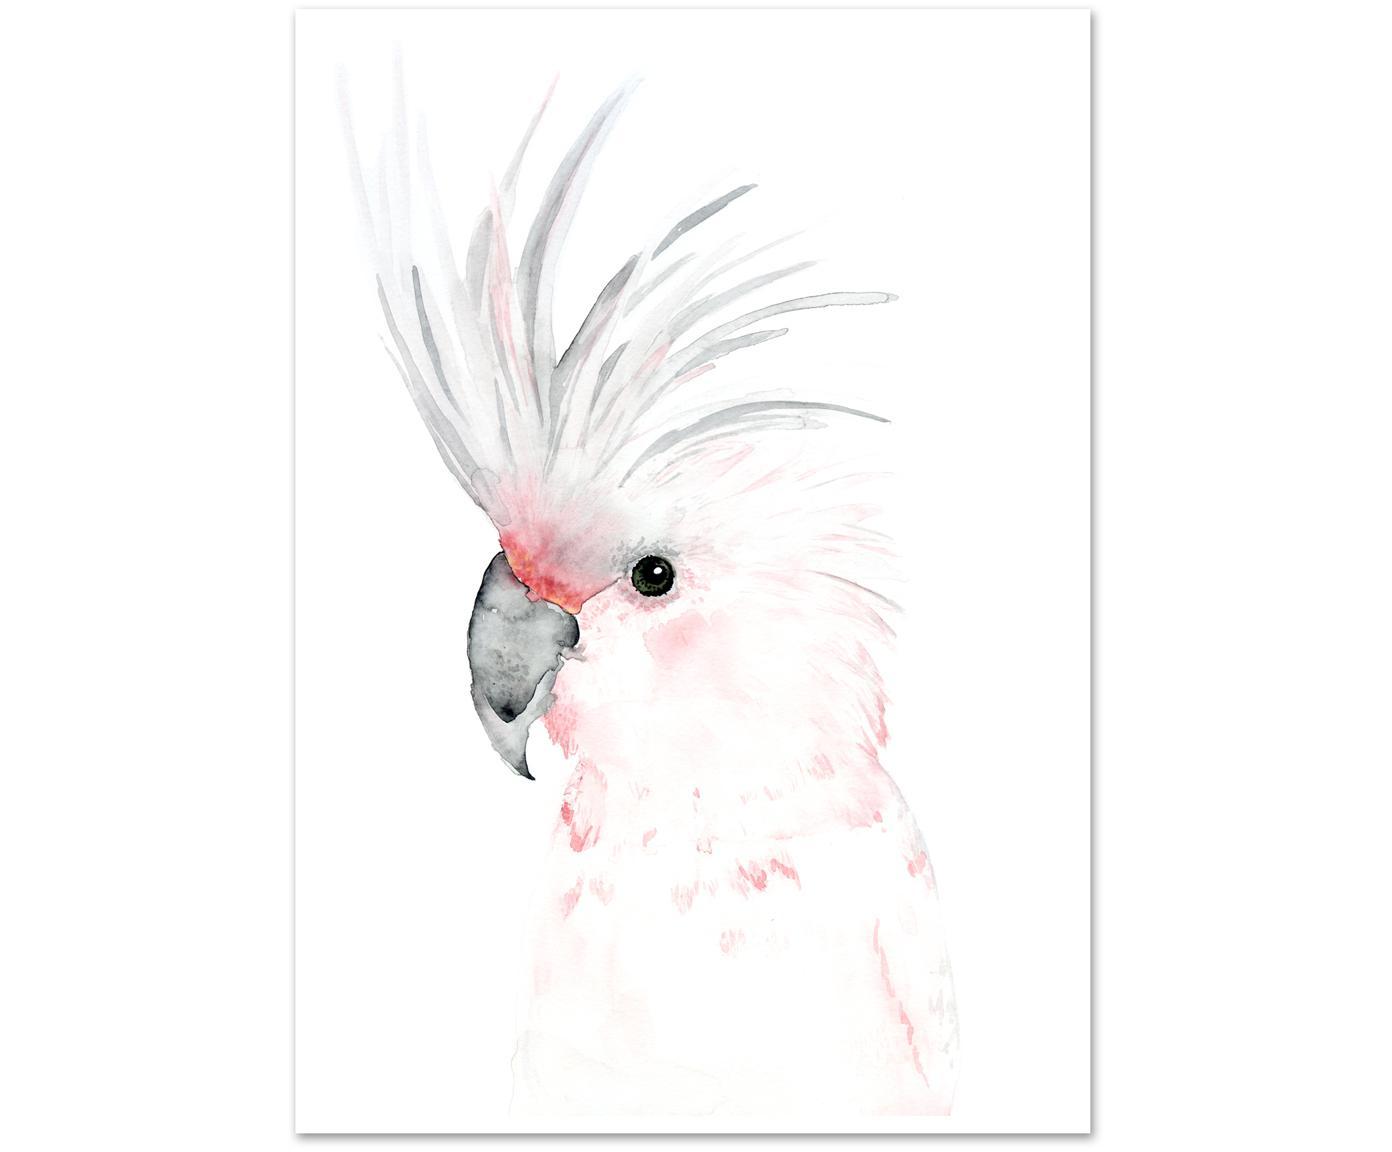 Póster Kakadu, Impresión digital sobre papel, 200g/m², Blanco,gris, rosa, An 21 x Al 30 cm